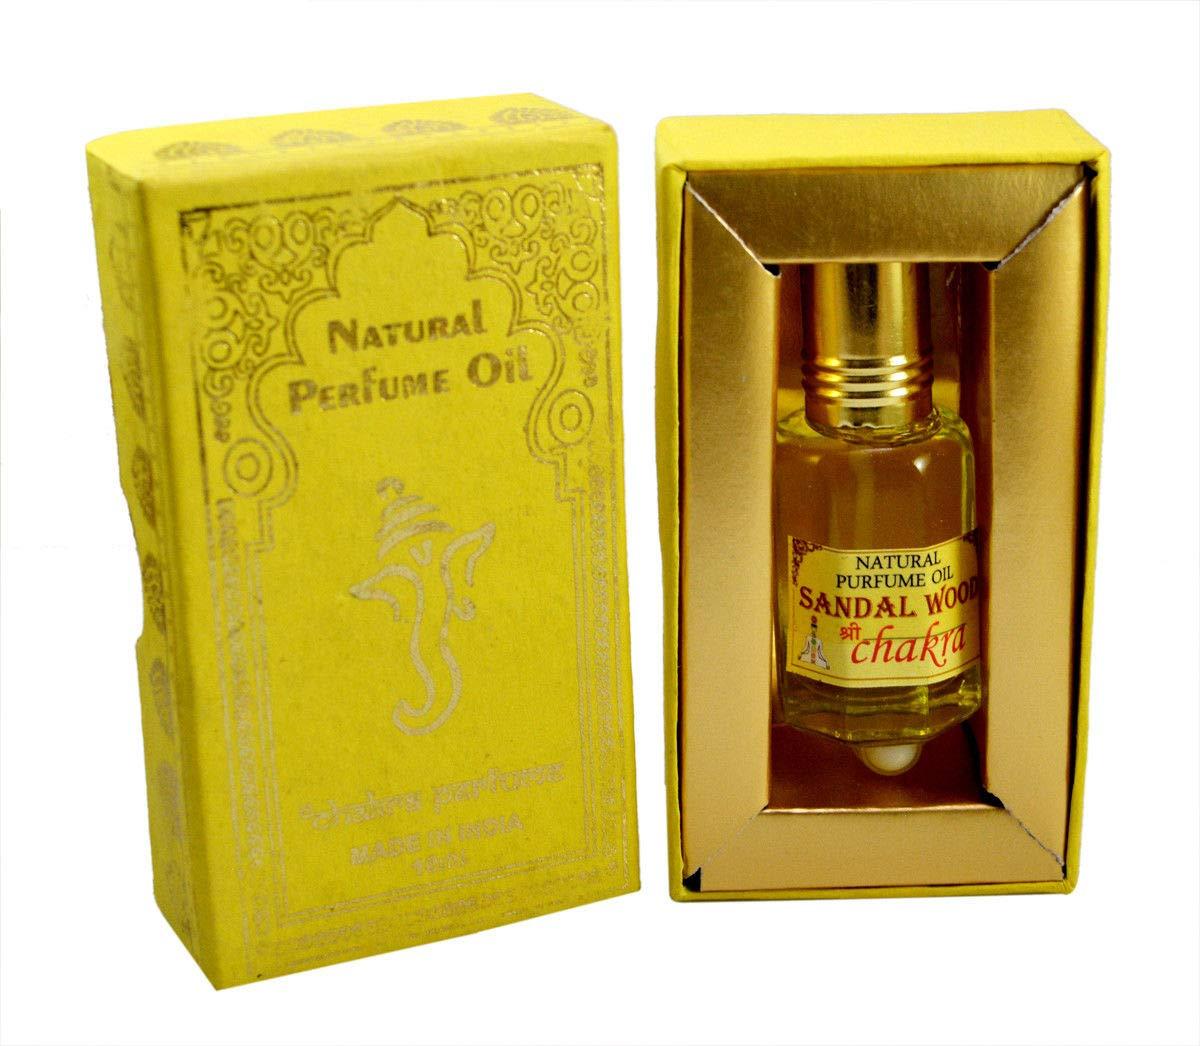 Chakra Natural Perfume Frangipani Fragrance 100% Pure Natural Oil 10ml Made in india